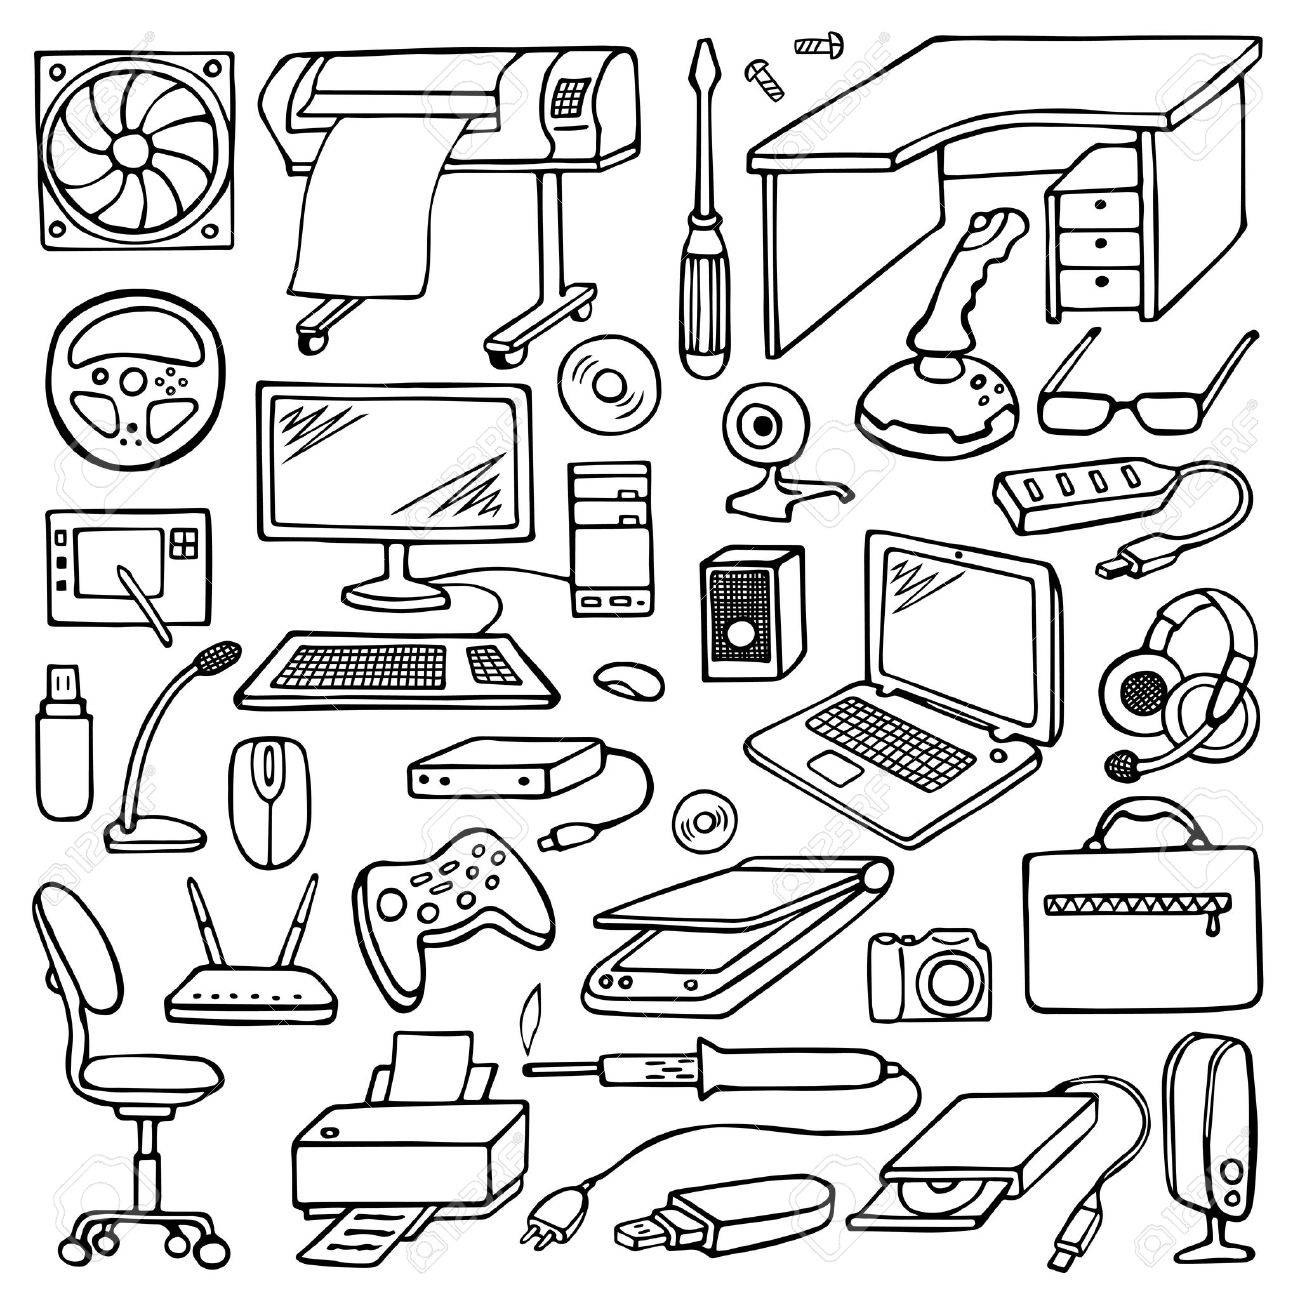 1300x1300 Hand Drawn Doodle Computer Set Royalty Free Cliparts, Vectors,